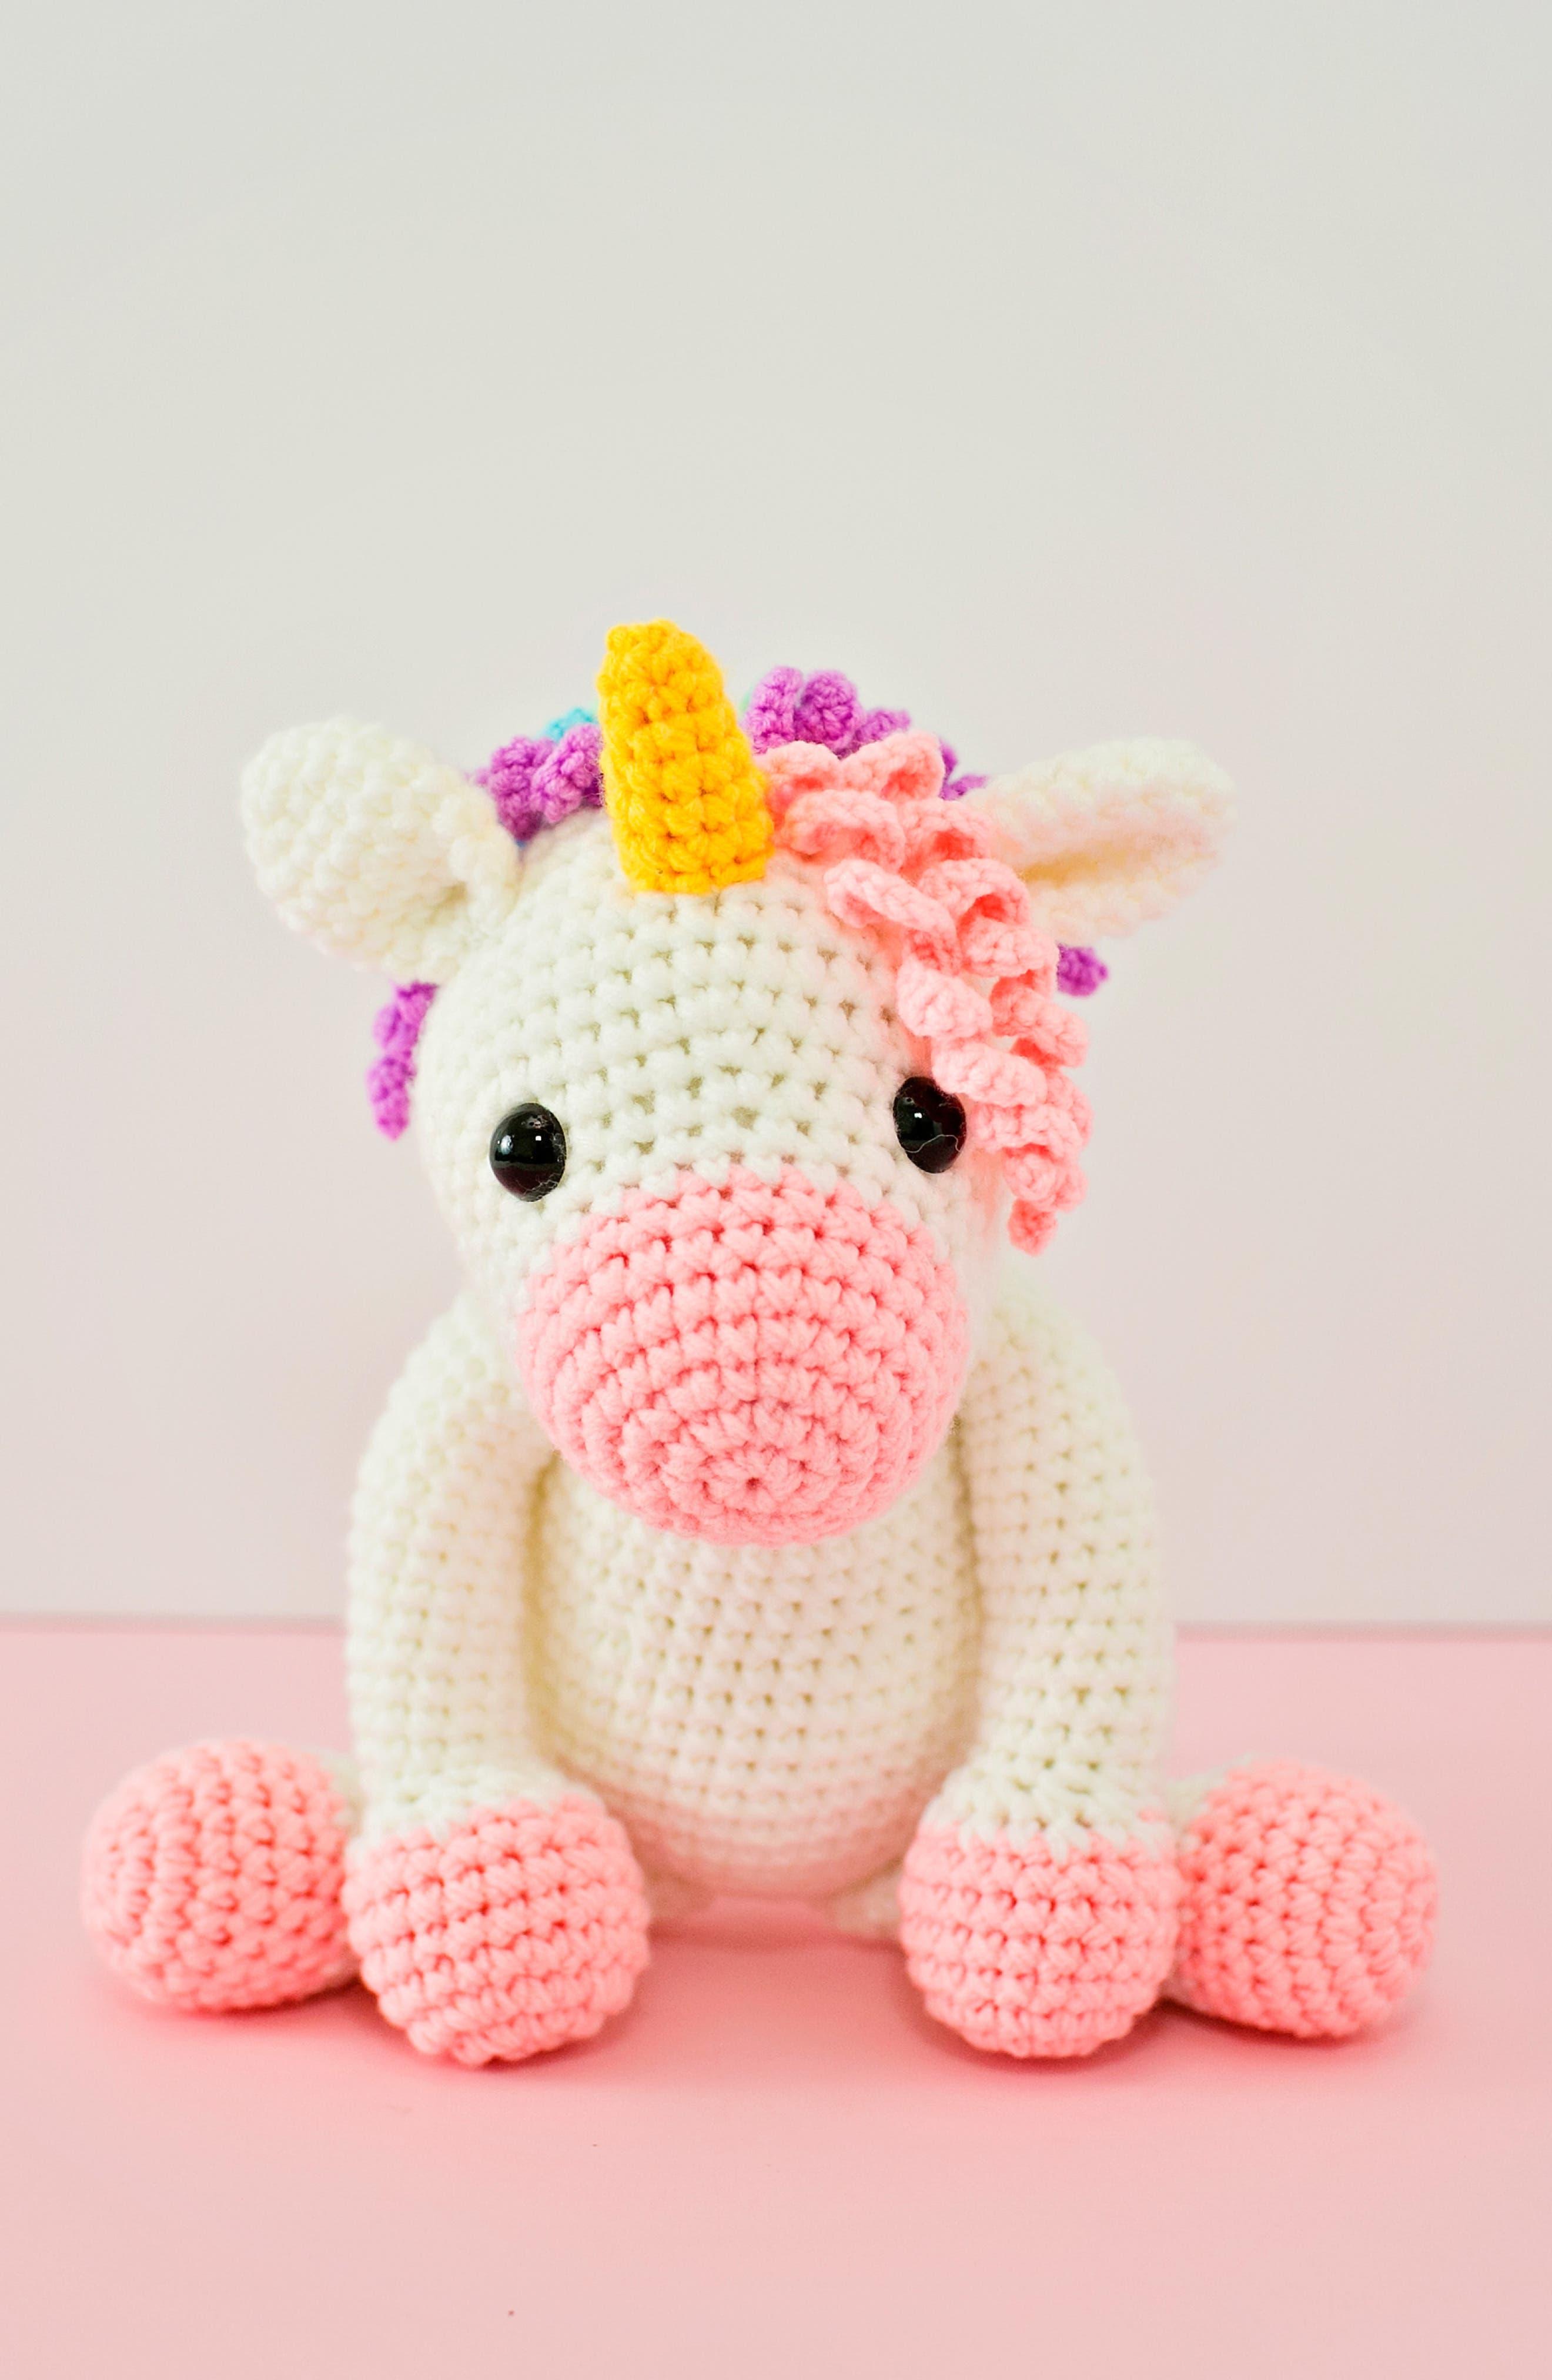 Twinks Crochet Unicorn Doll,                             Alternate thumbnail 4, color,                             WHITE/ MULTI